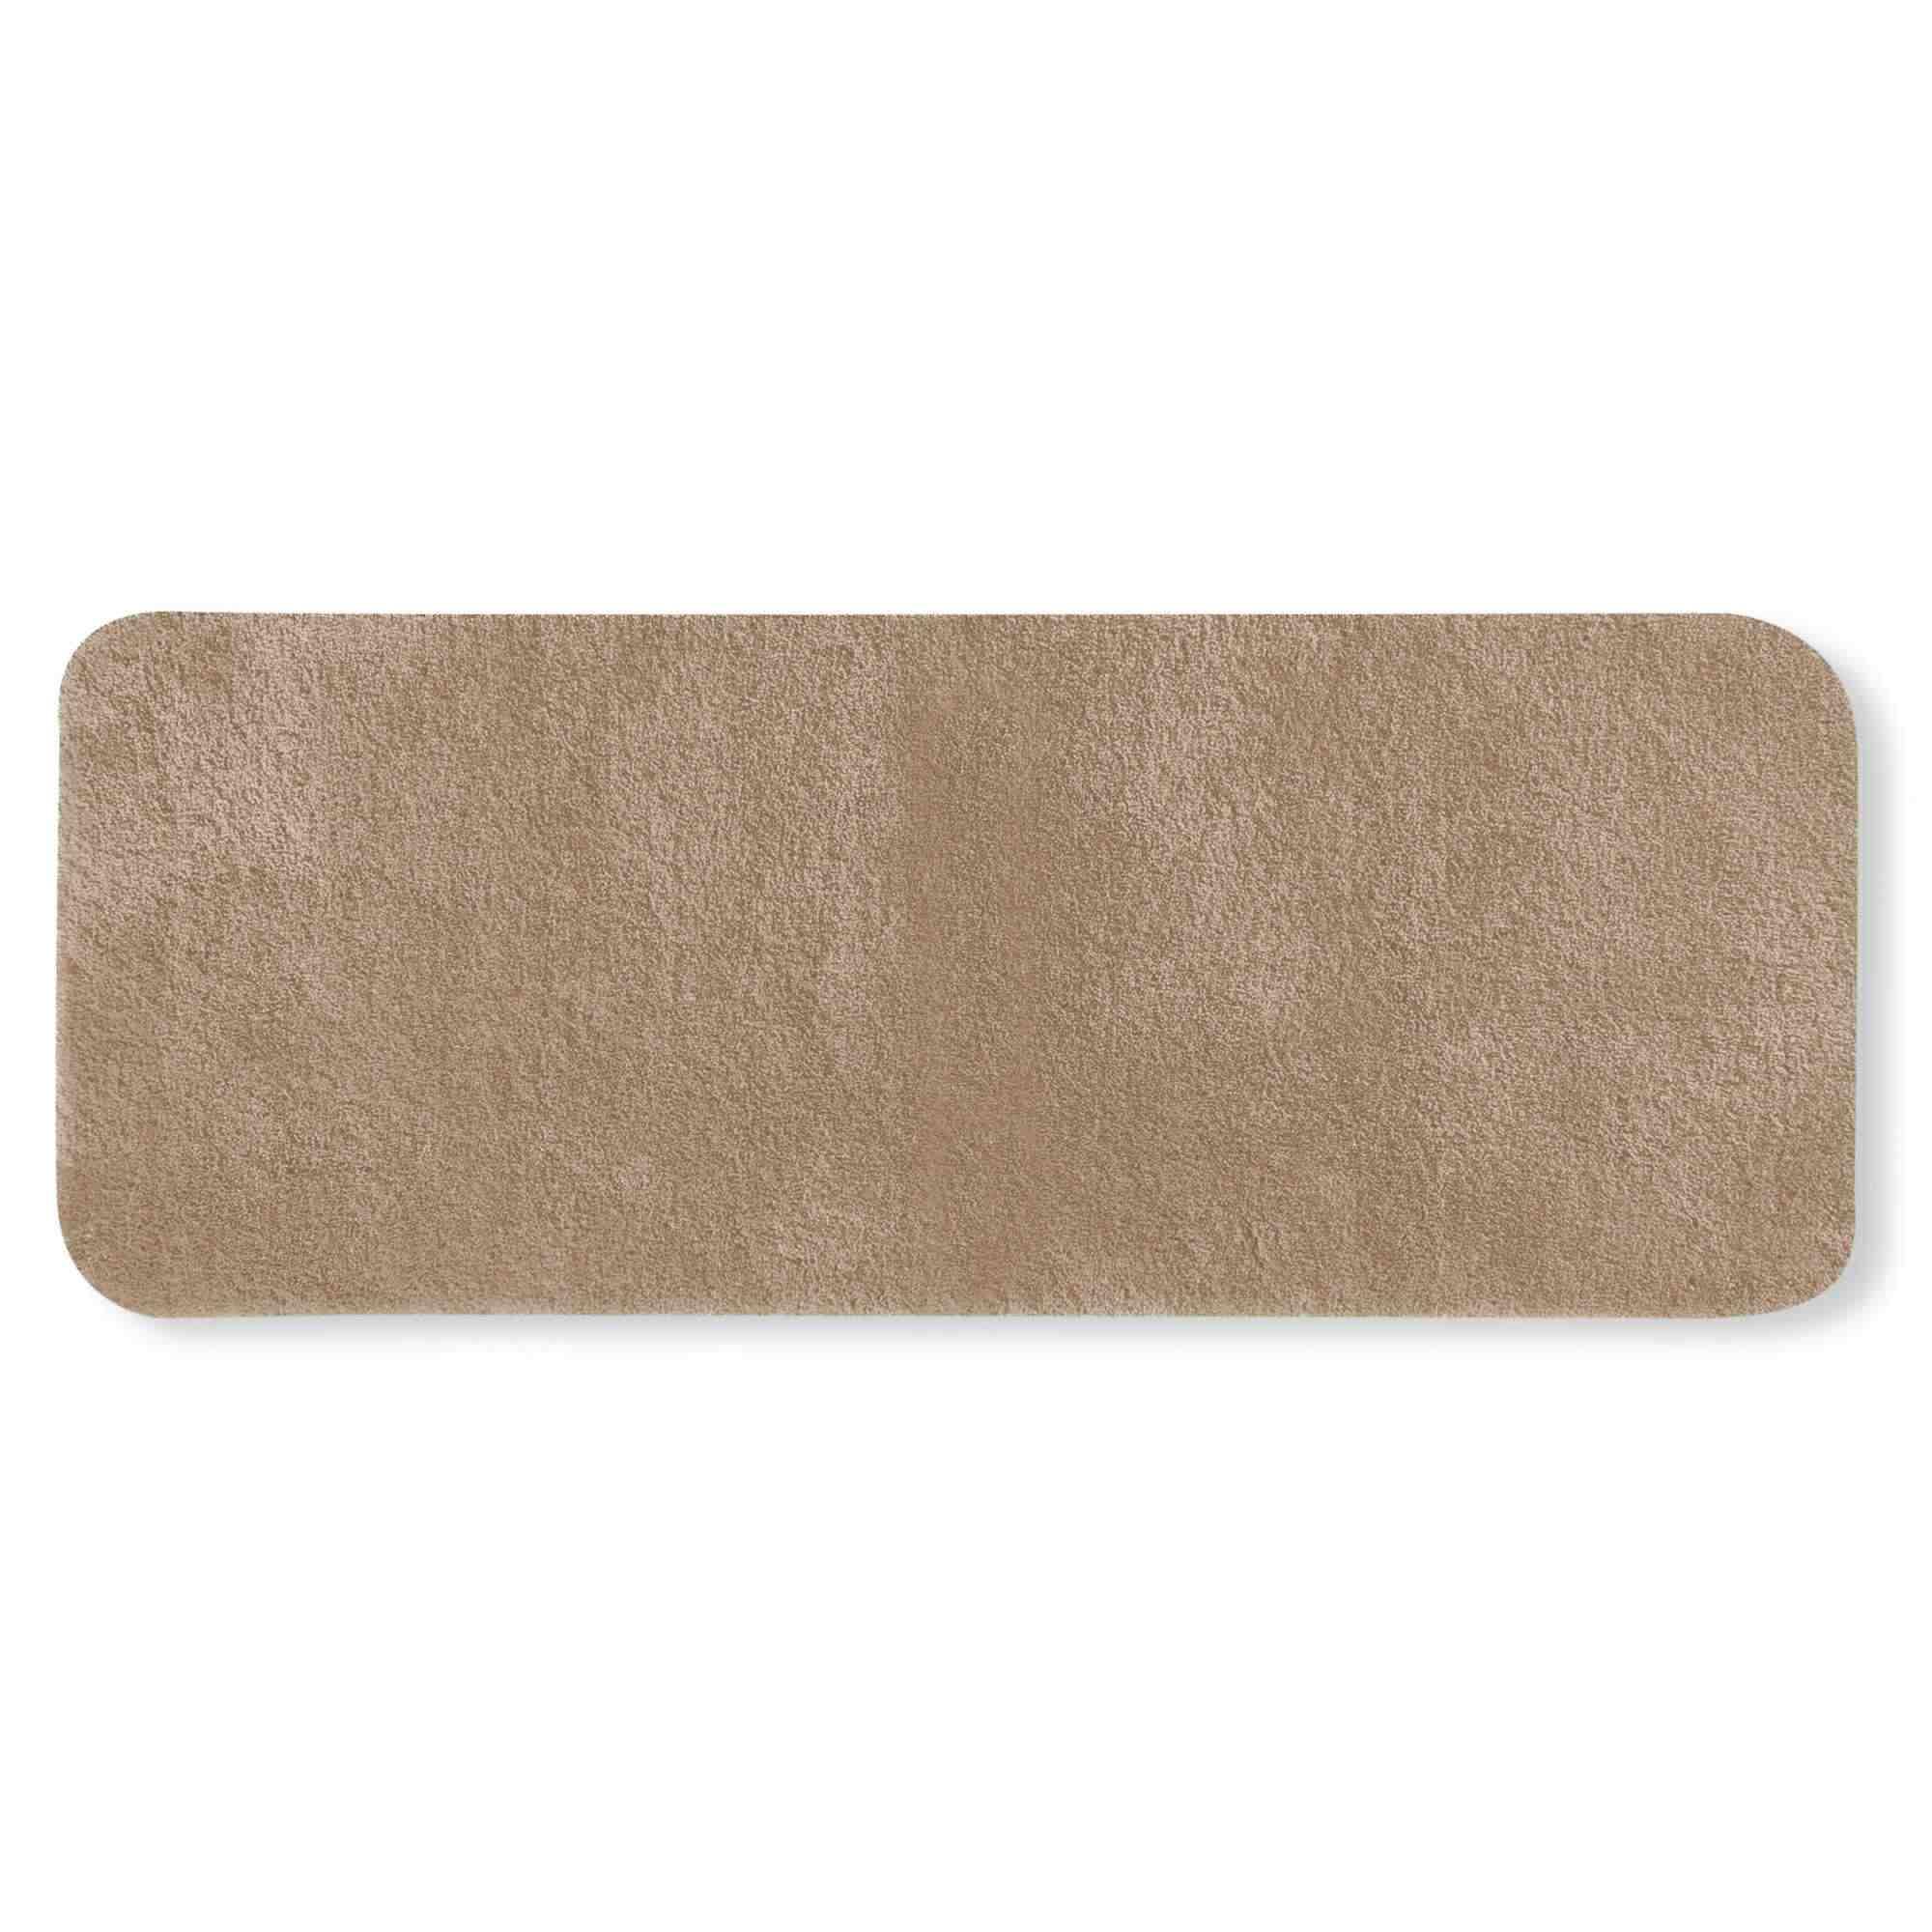 bath mats rug skid bathtub hole seniors slip no for shower floor non bathroom rubber drain mat large with flooring best corner